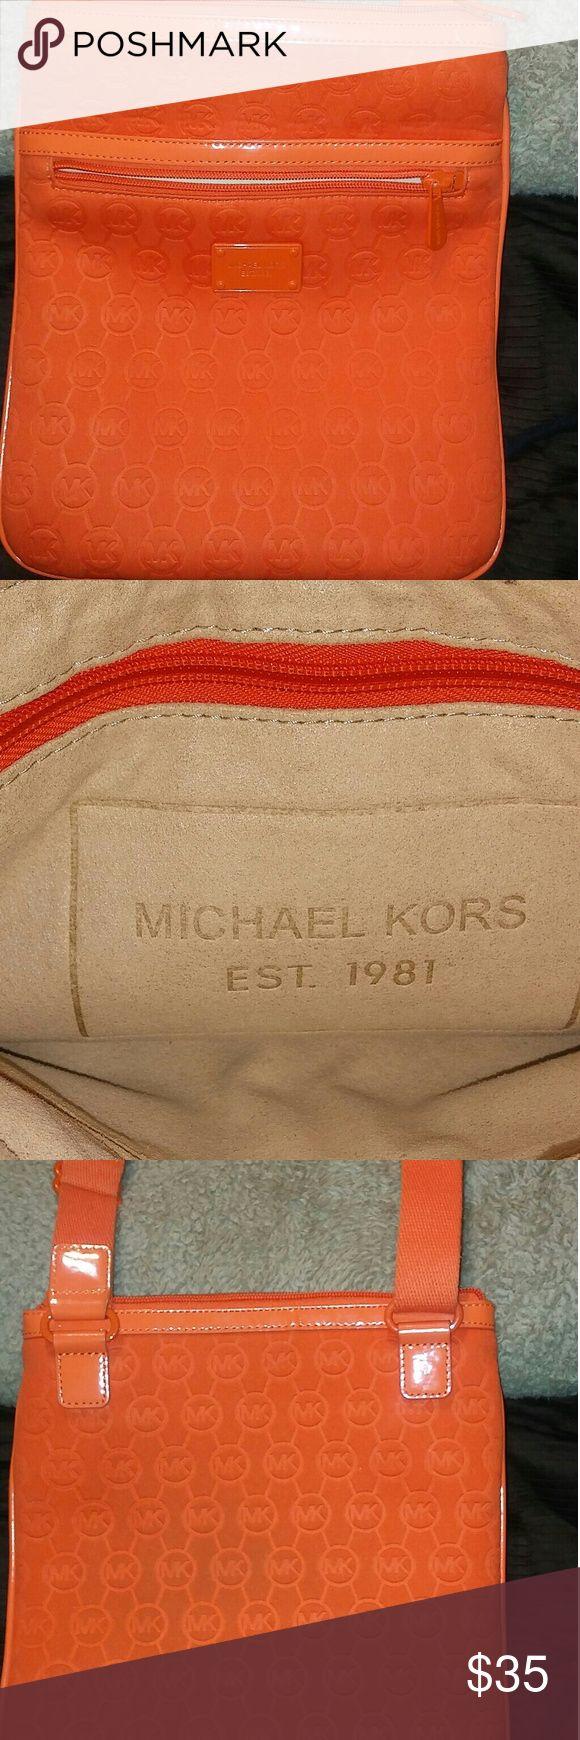 Michael Kors orange neoprene laptop tote Michael Kors orange laptop tote, previously owned great condition Michael Kors Bags Laptop Bags